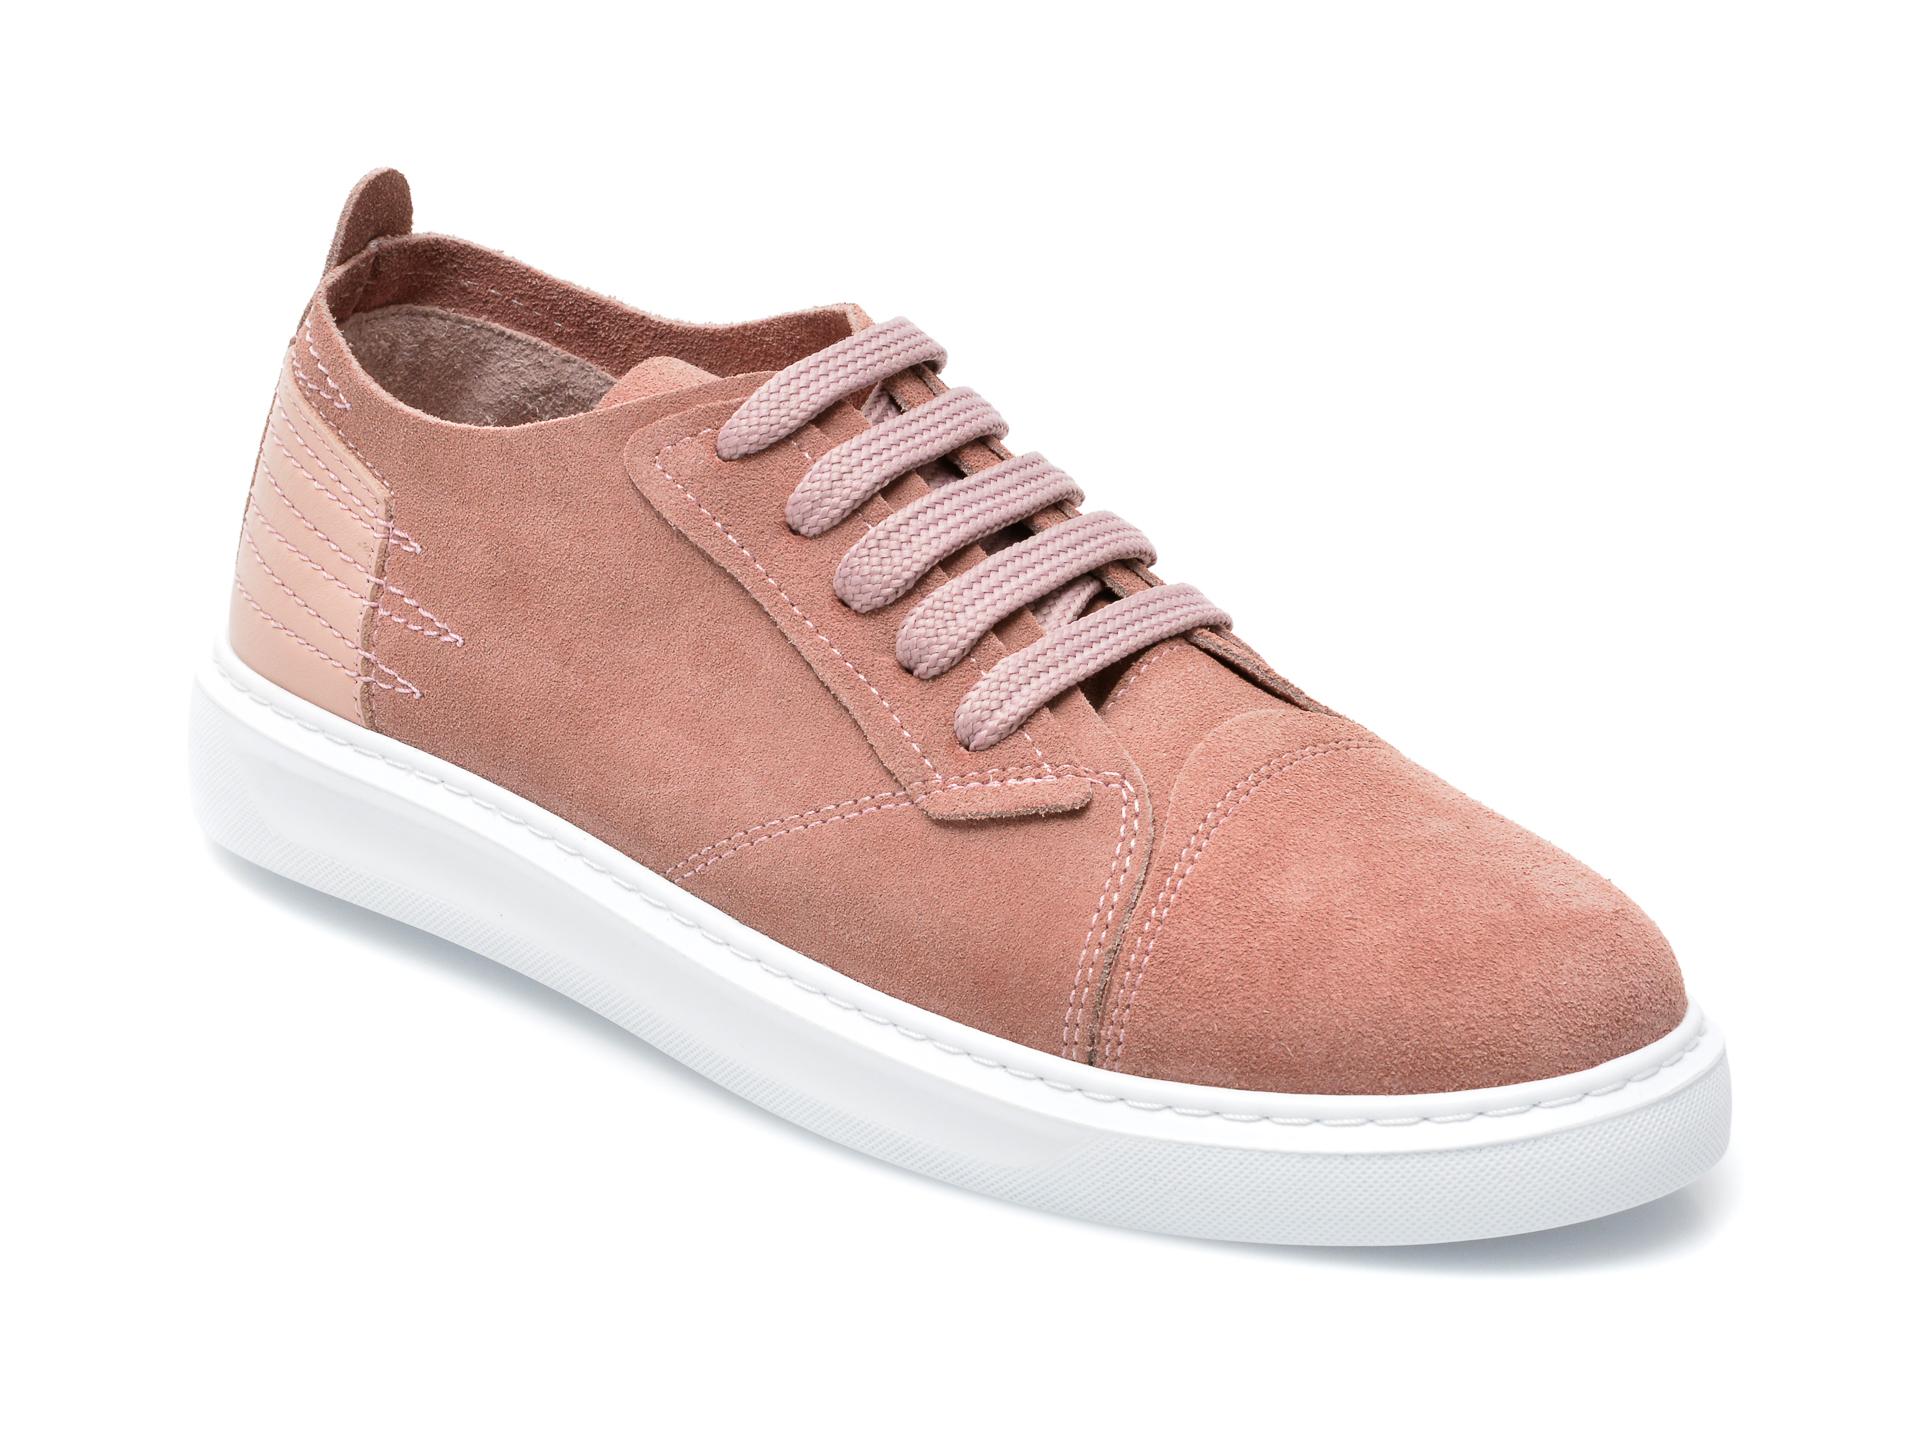 Pantofi IMAGE roz, 89081, din piele intoarsa imagine otter.ro